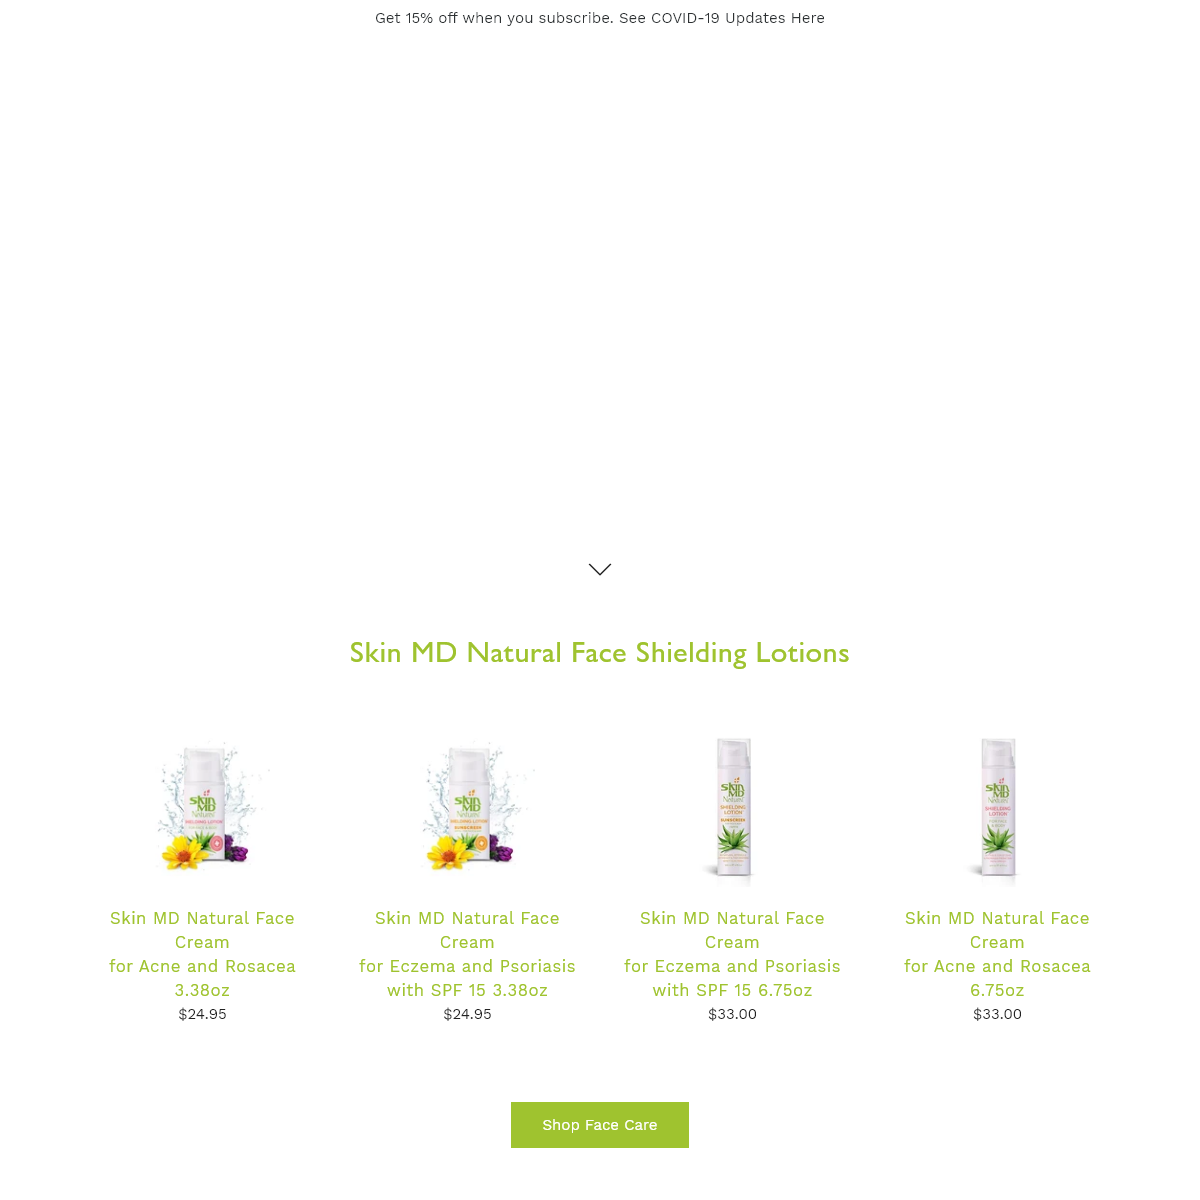 Skin MD Natural Botanical Skincare – SkinMDNatural